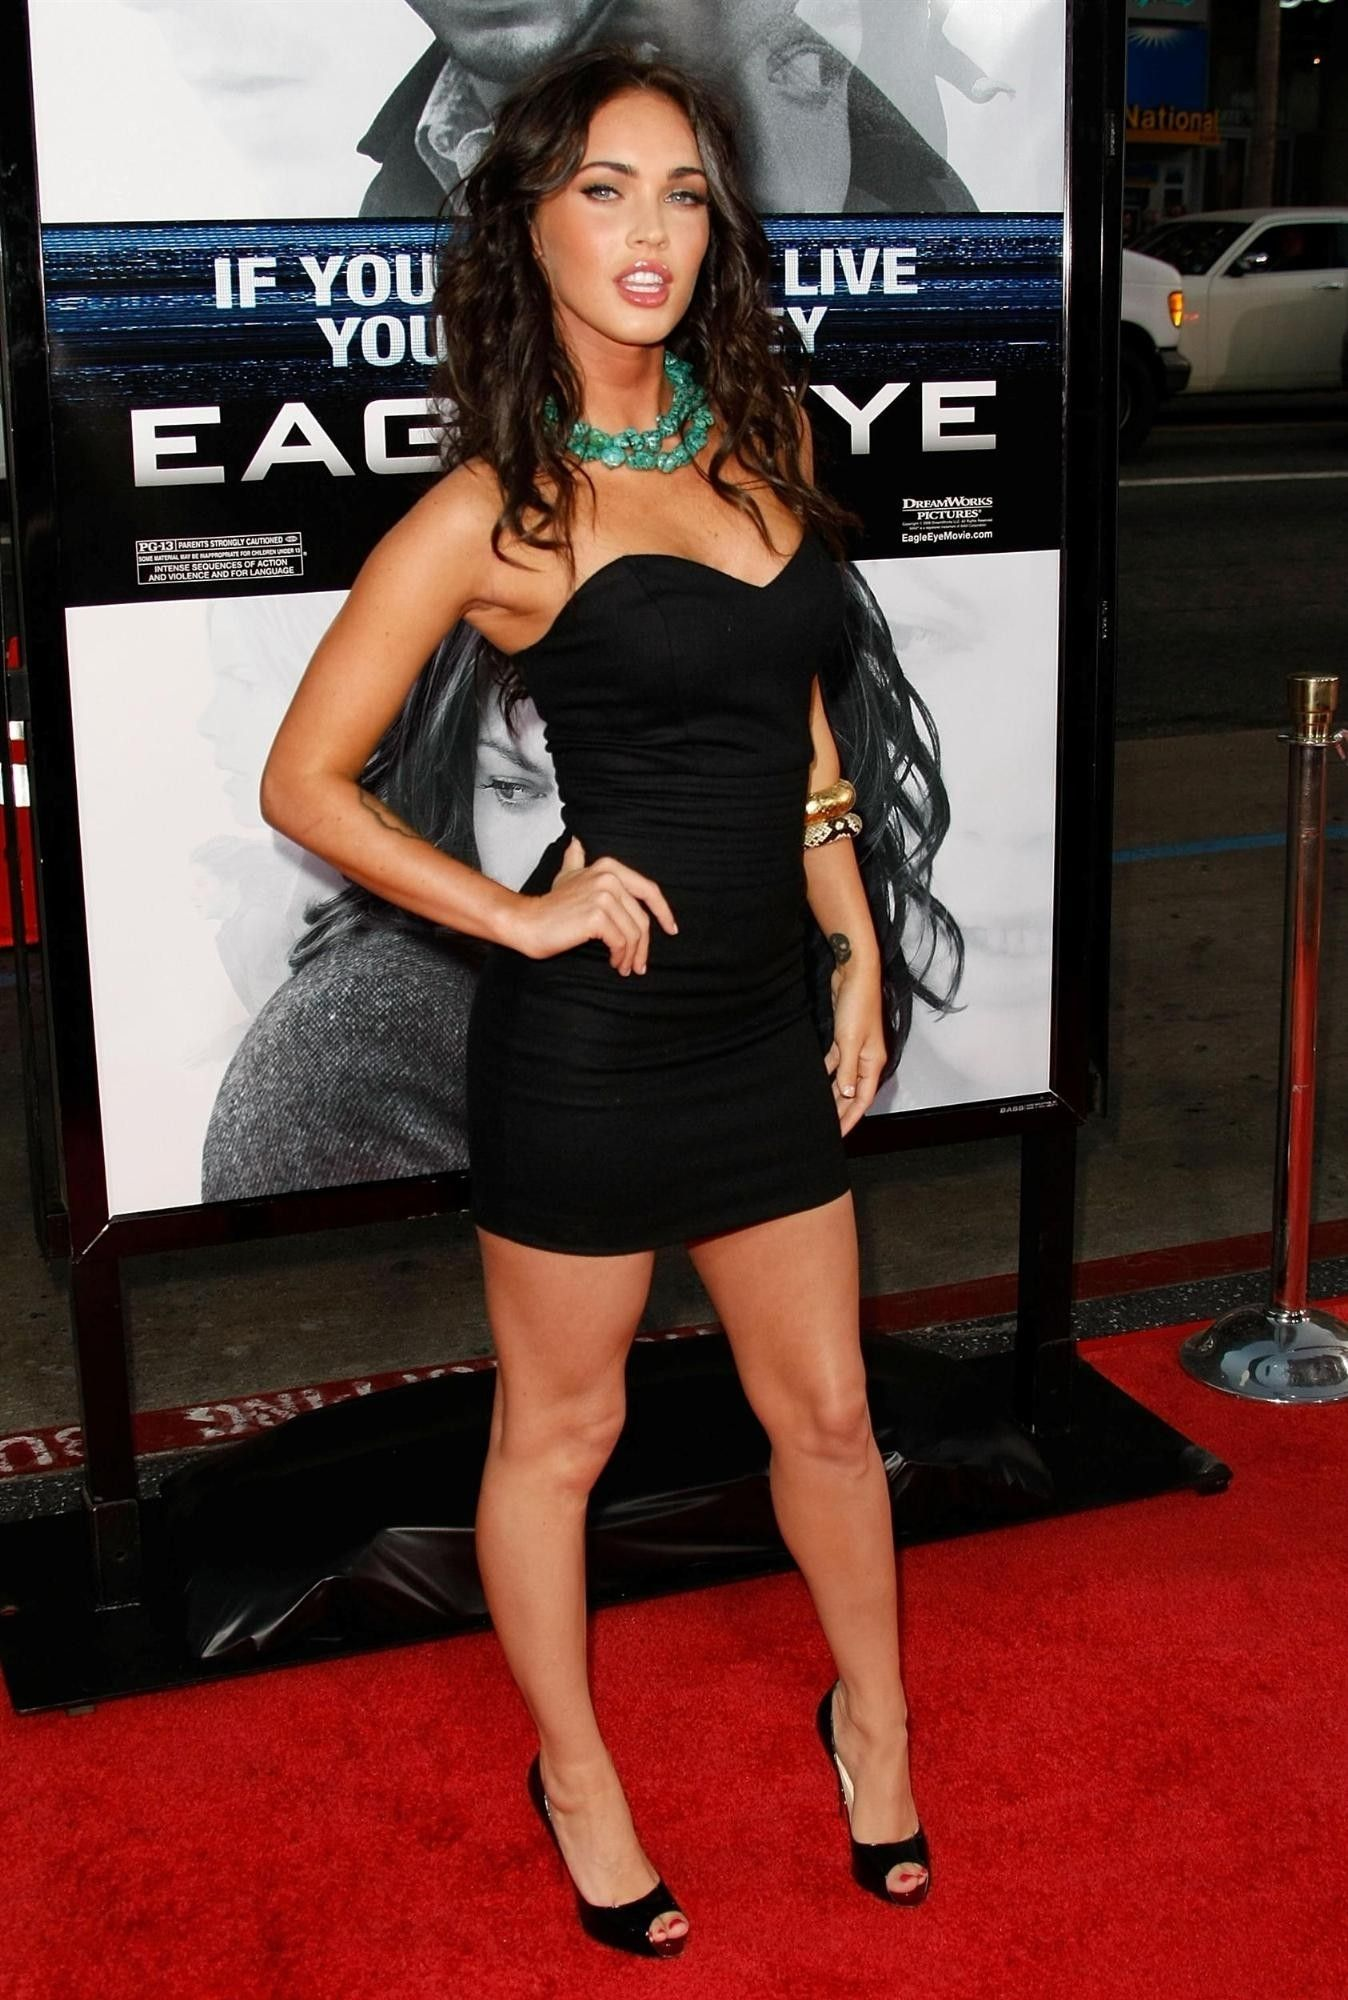 ed0cfa7329c brunettes tattoos women megan fox actress celebrity high heels red ...